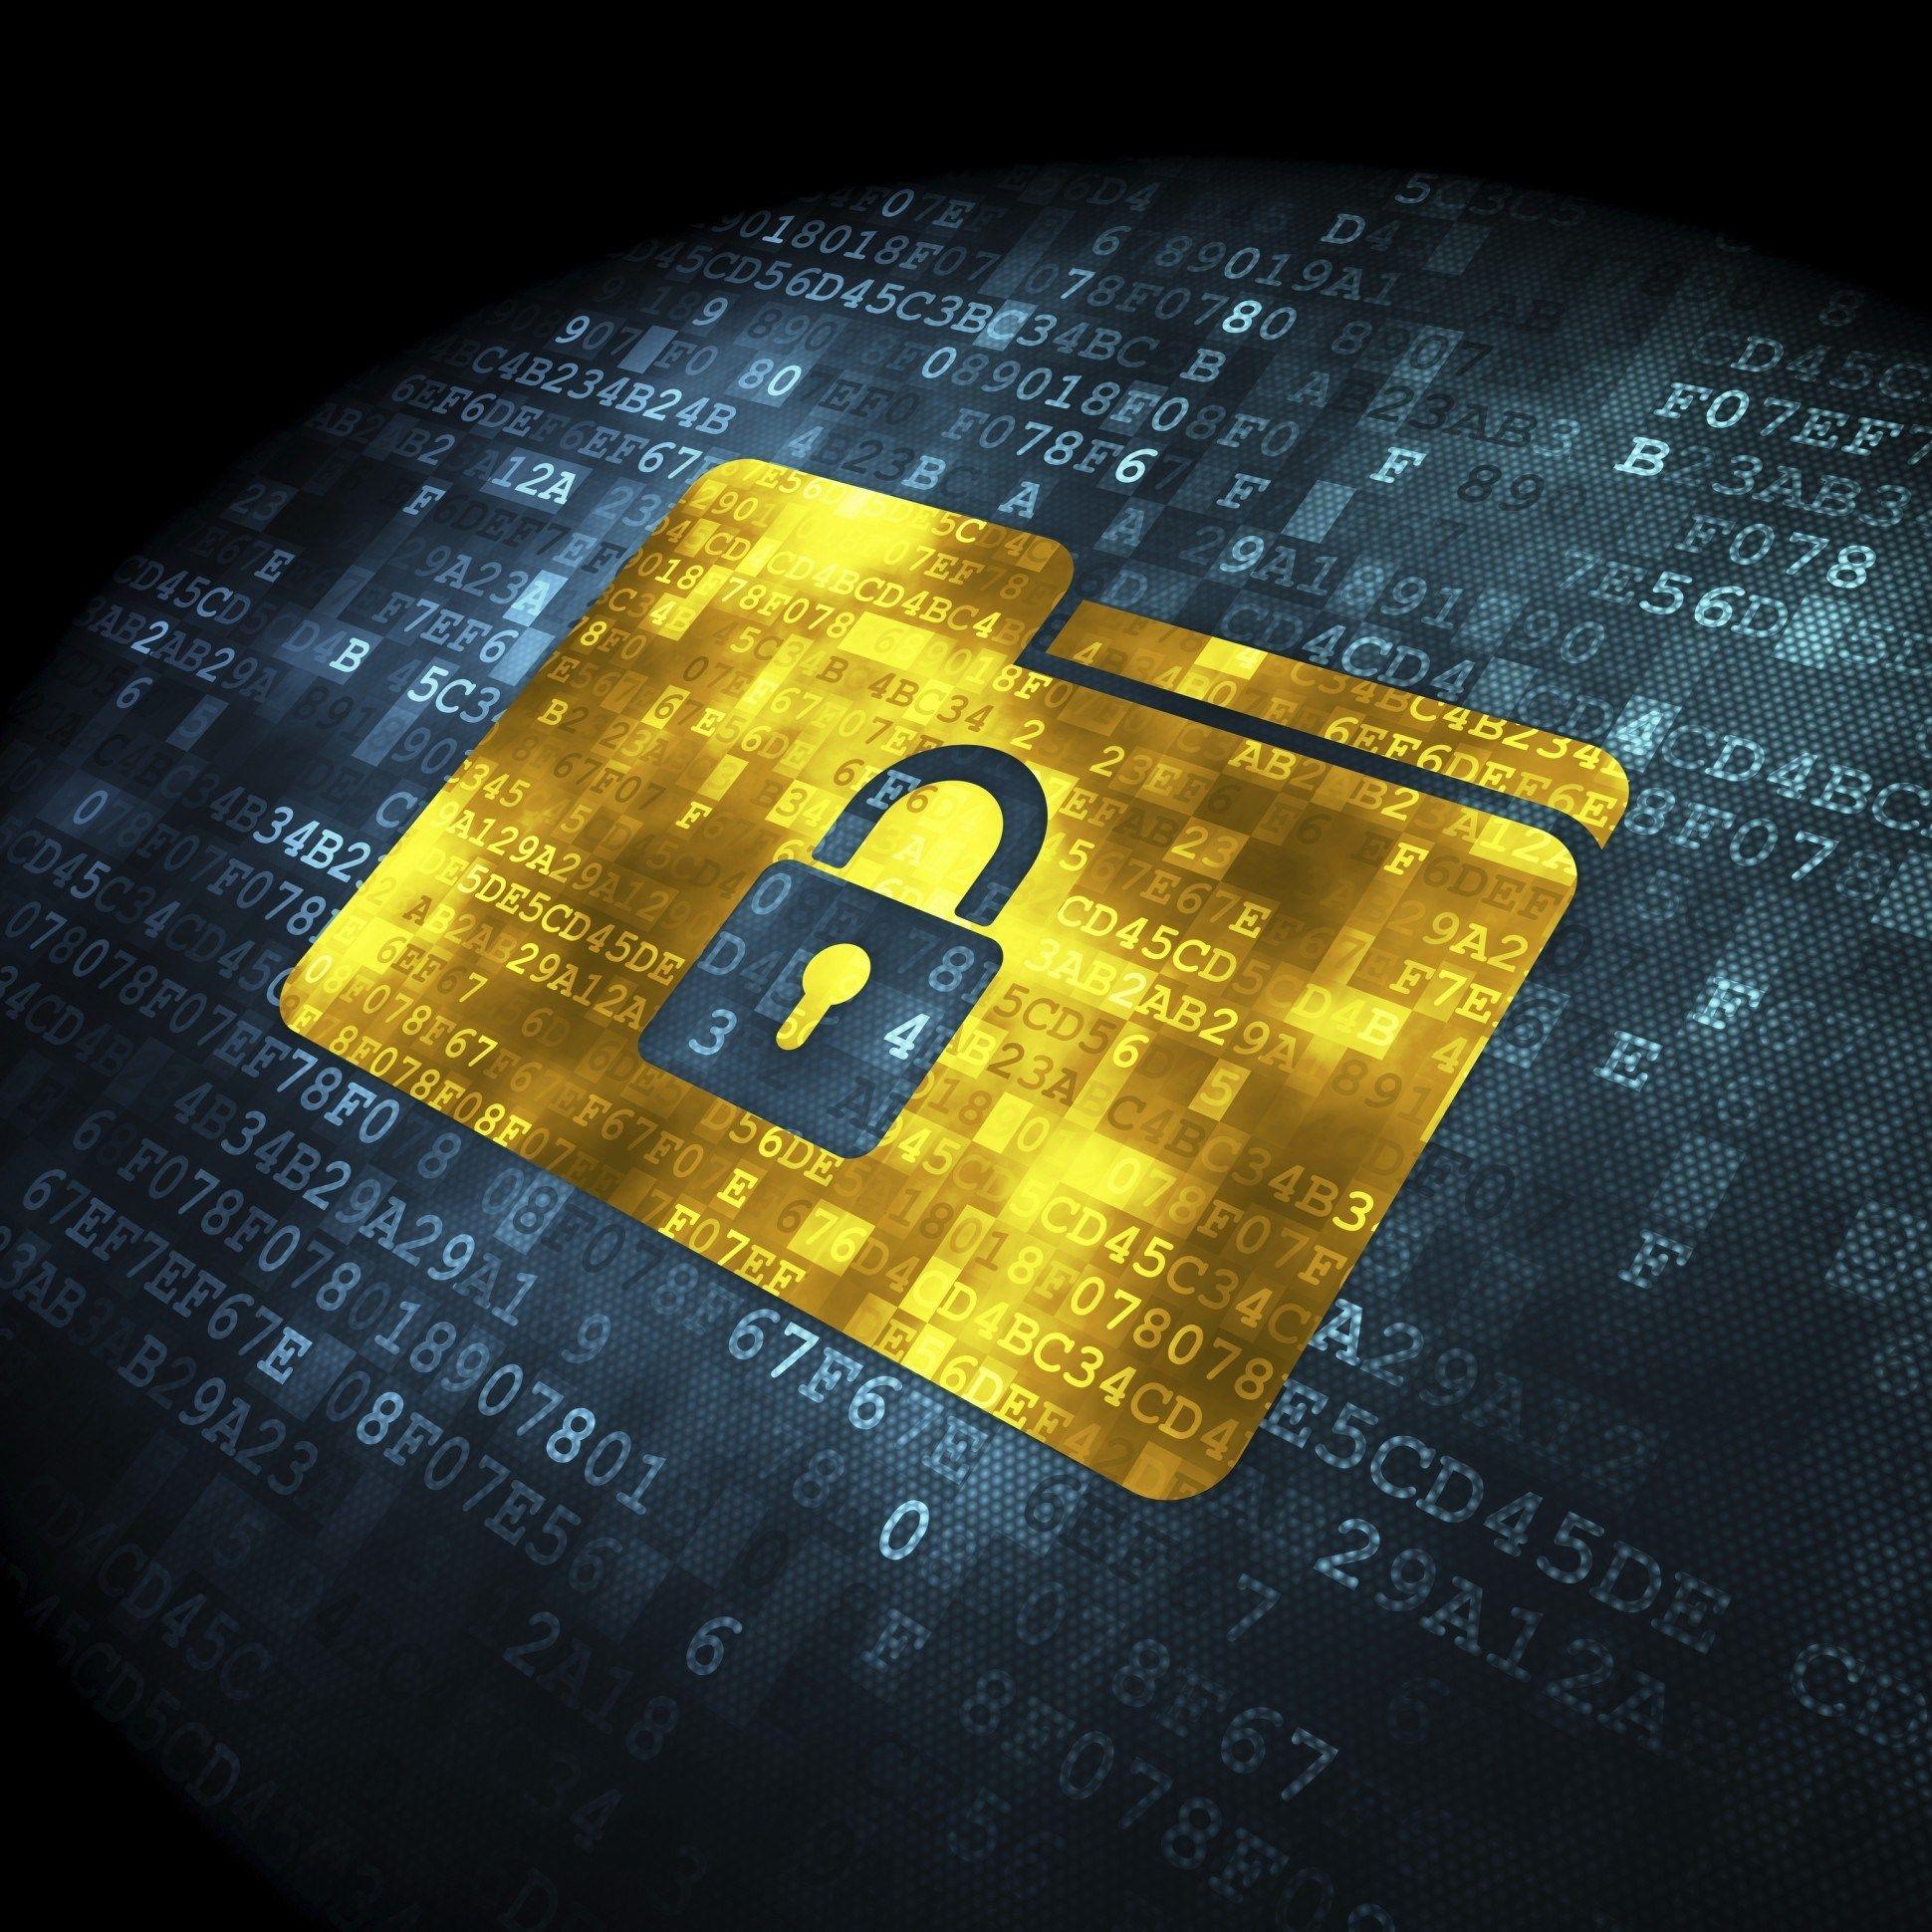 mobile symantec wallpaper Mobile data, Norton security